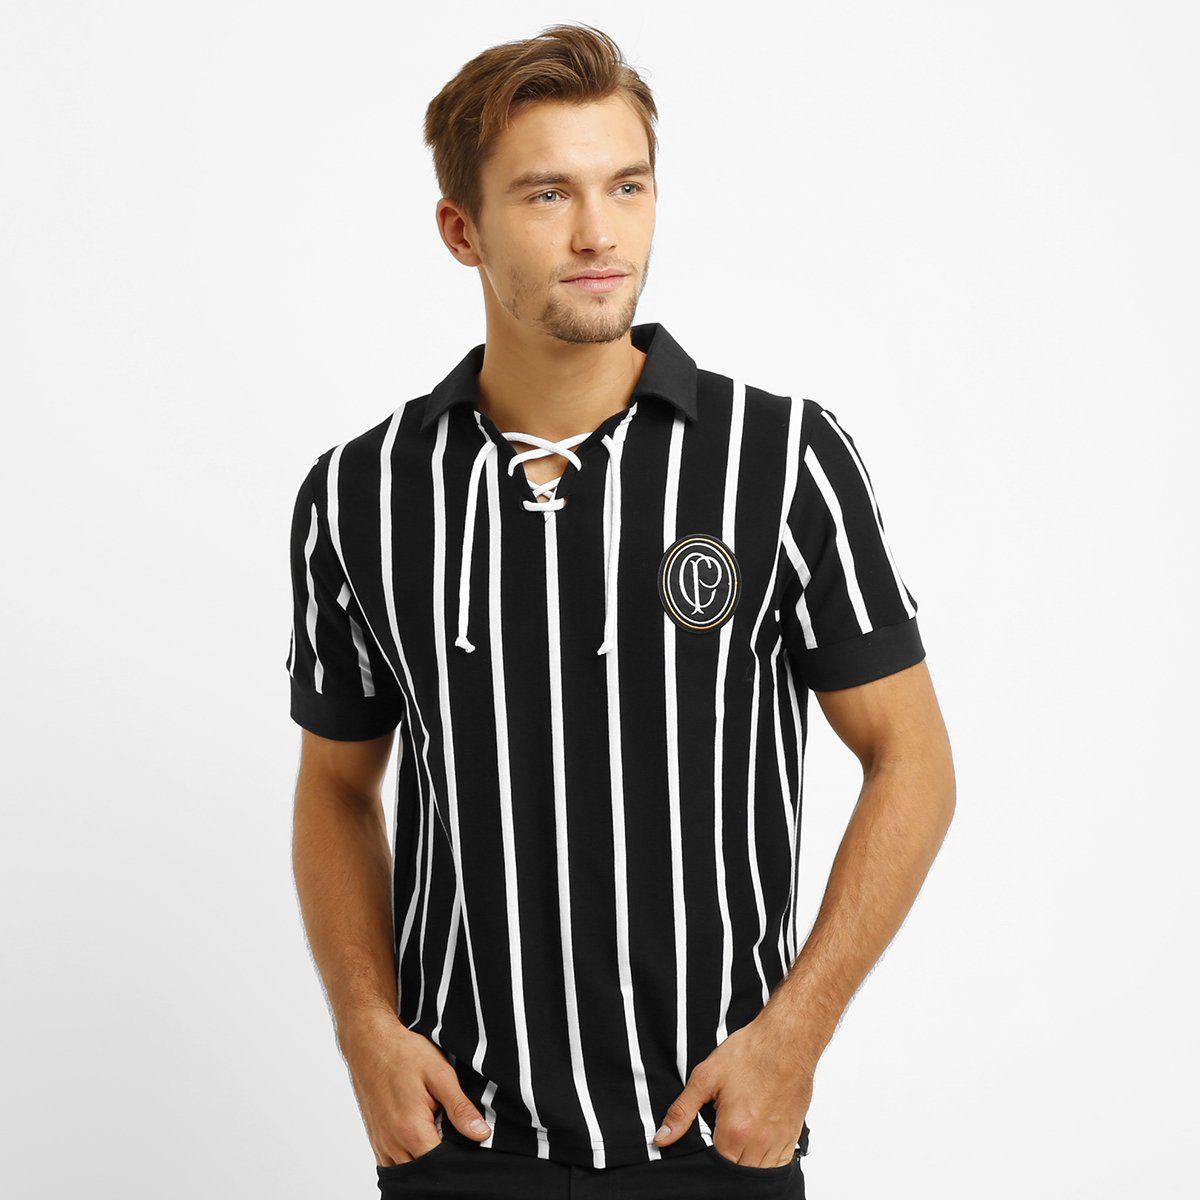 Camiseta Retrô Corinthians 1915 Masculina